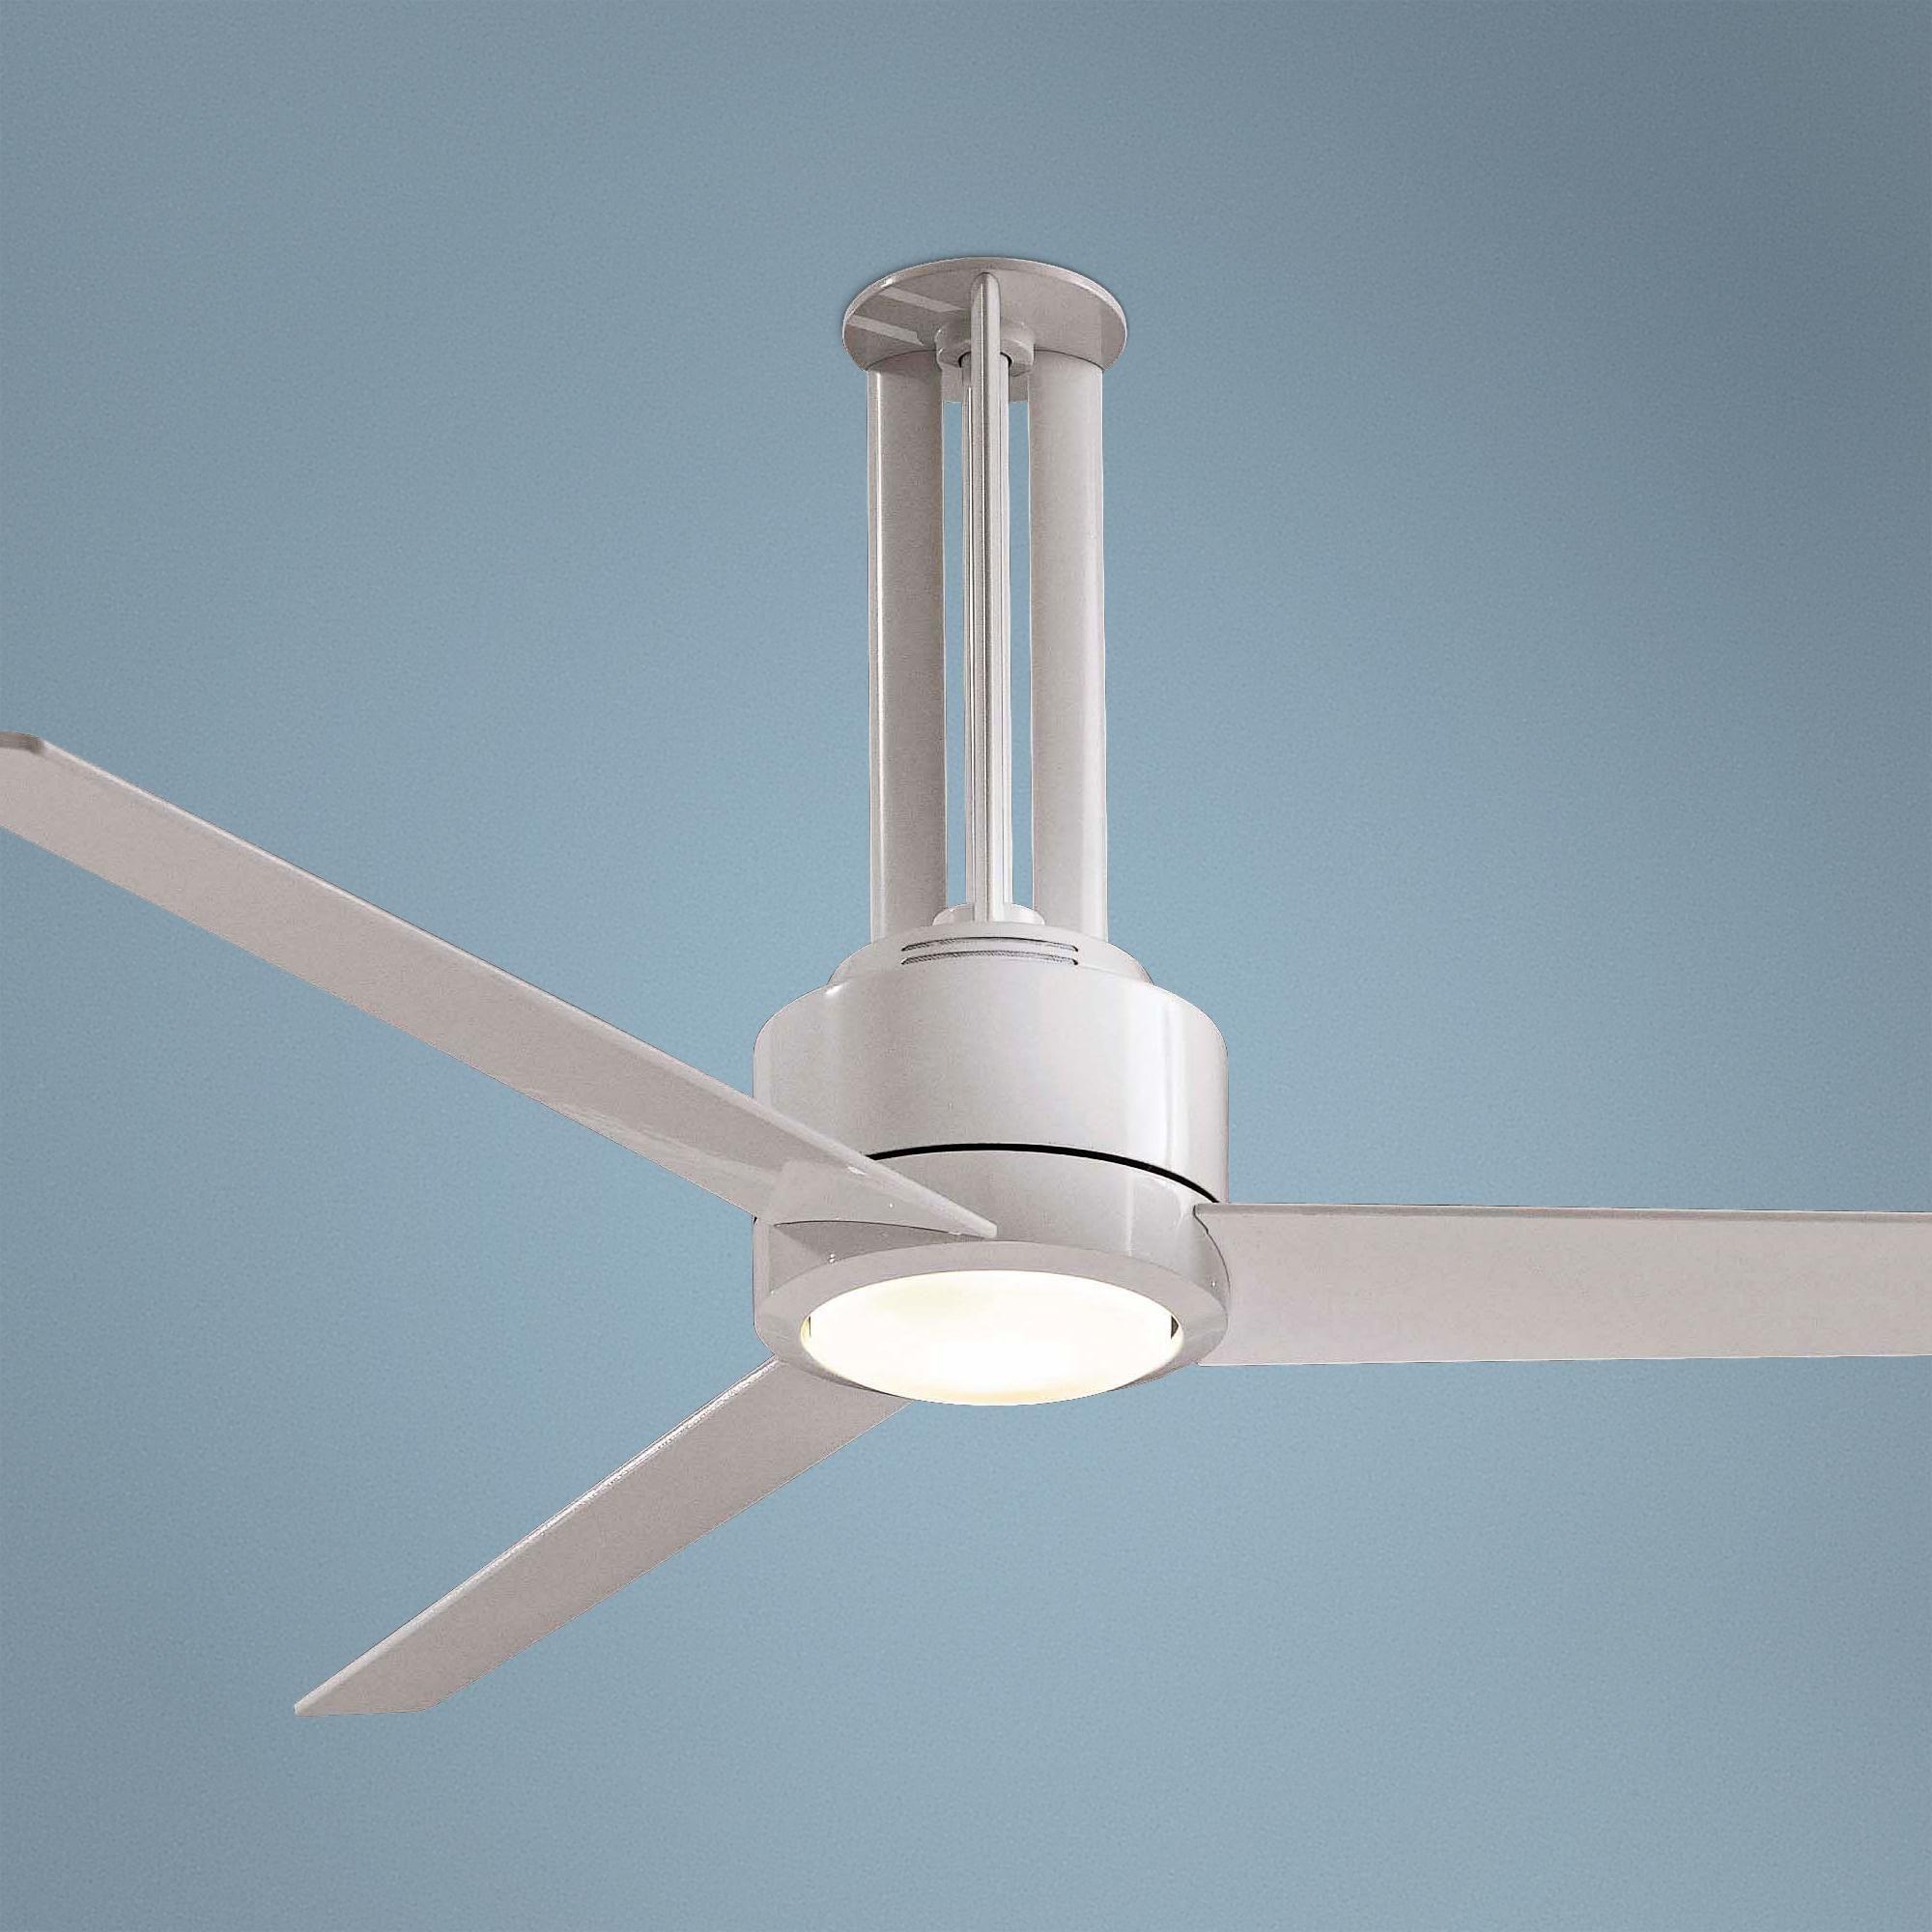 56 minka aire flyte white ceiling fan ceiling fans pinterest 56 minka aire flyte white ceiling fan aloadofball Images